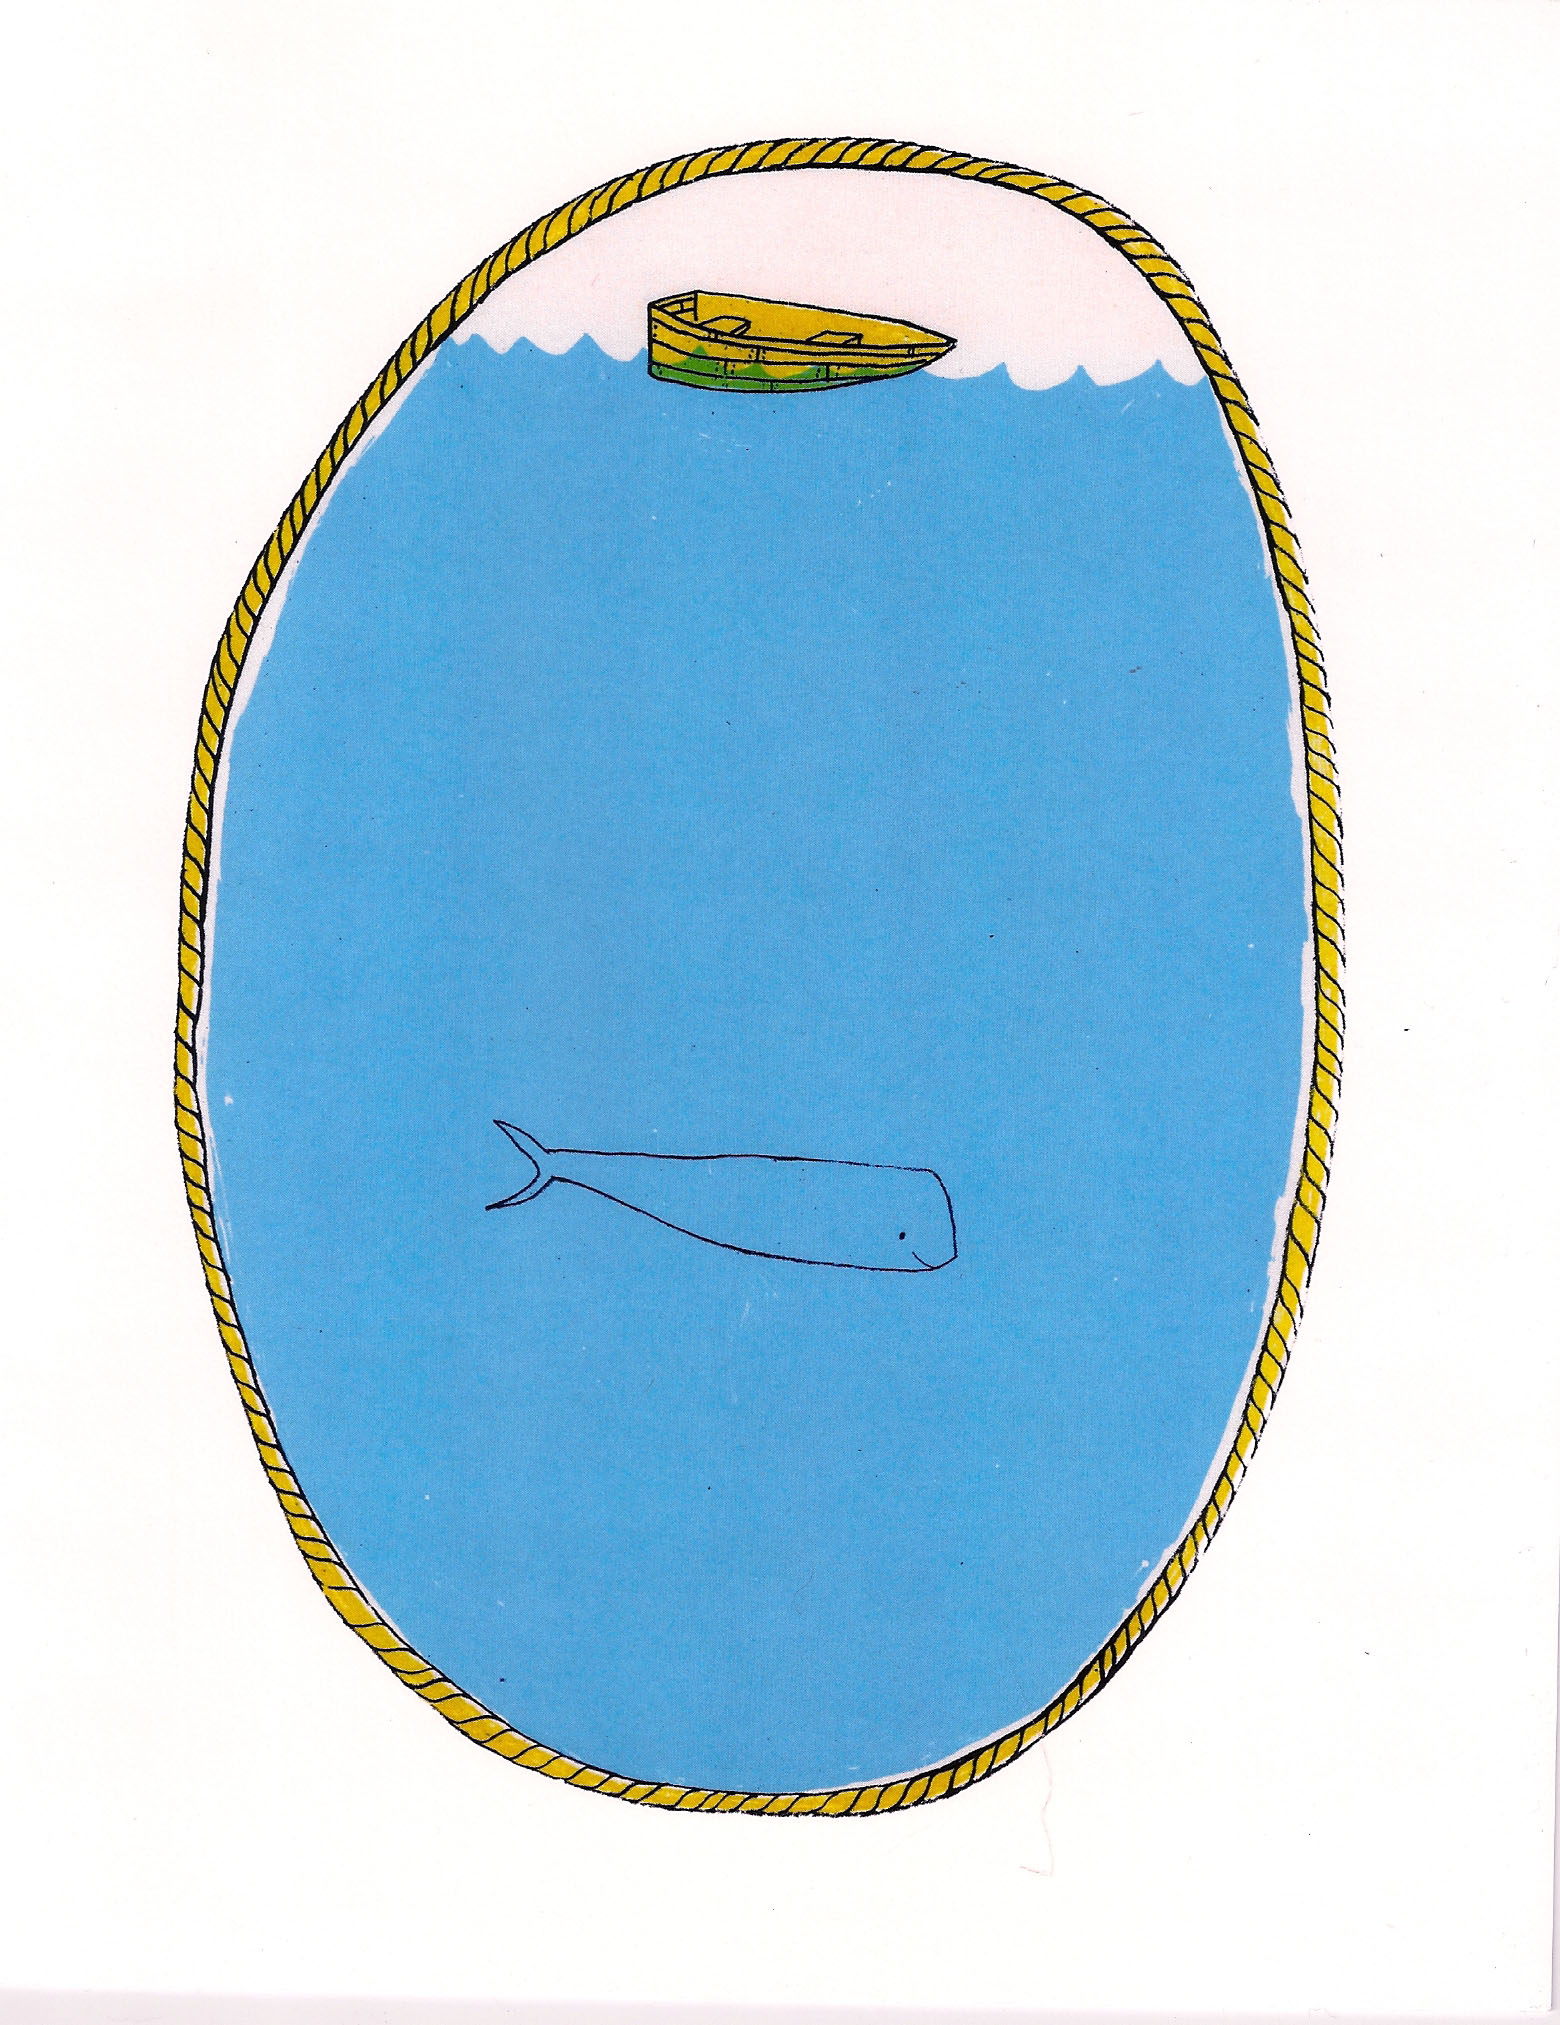 Whale Watch 8X10 Digital print $25